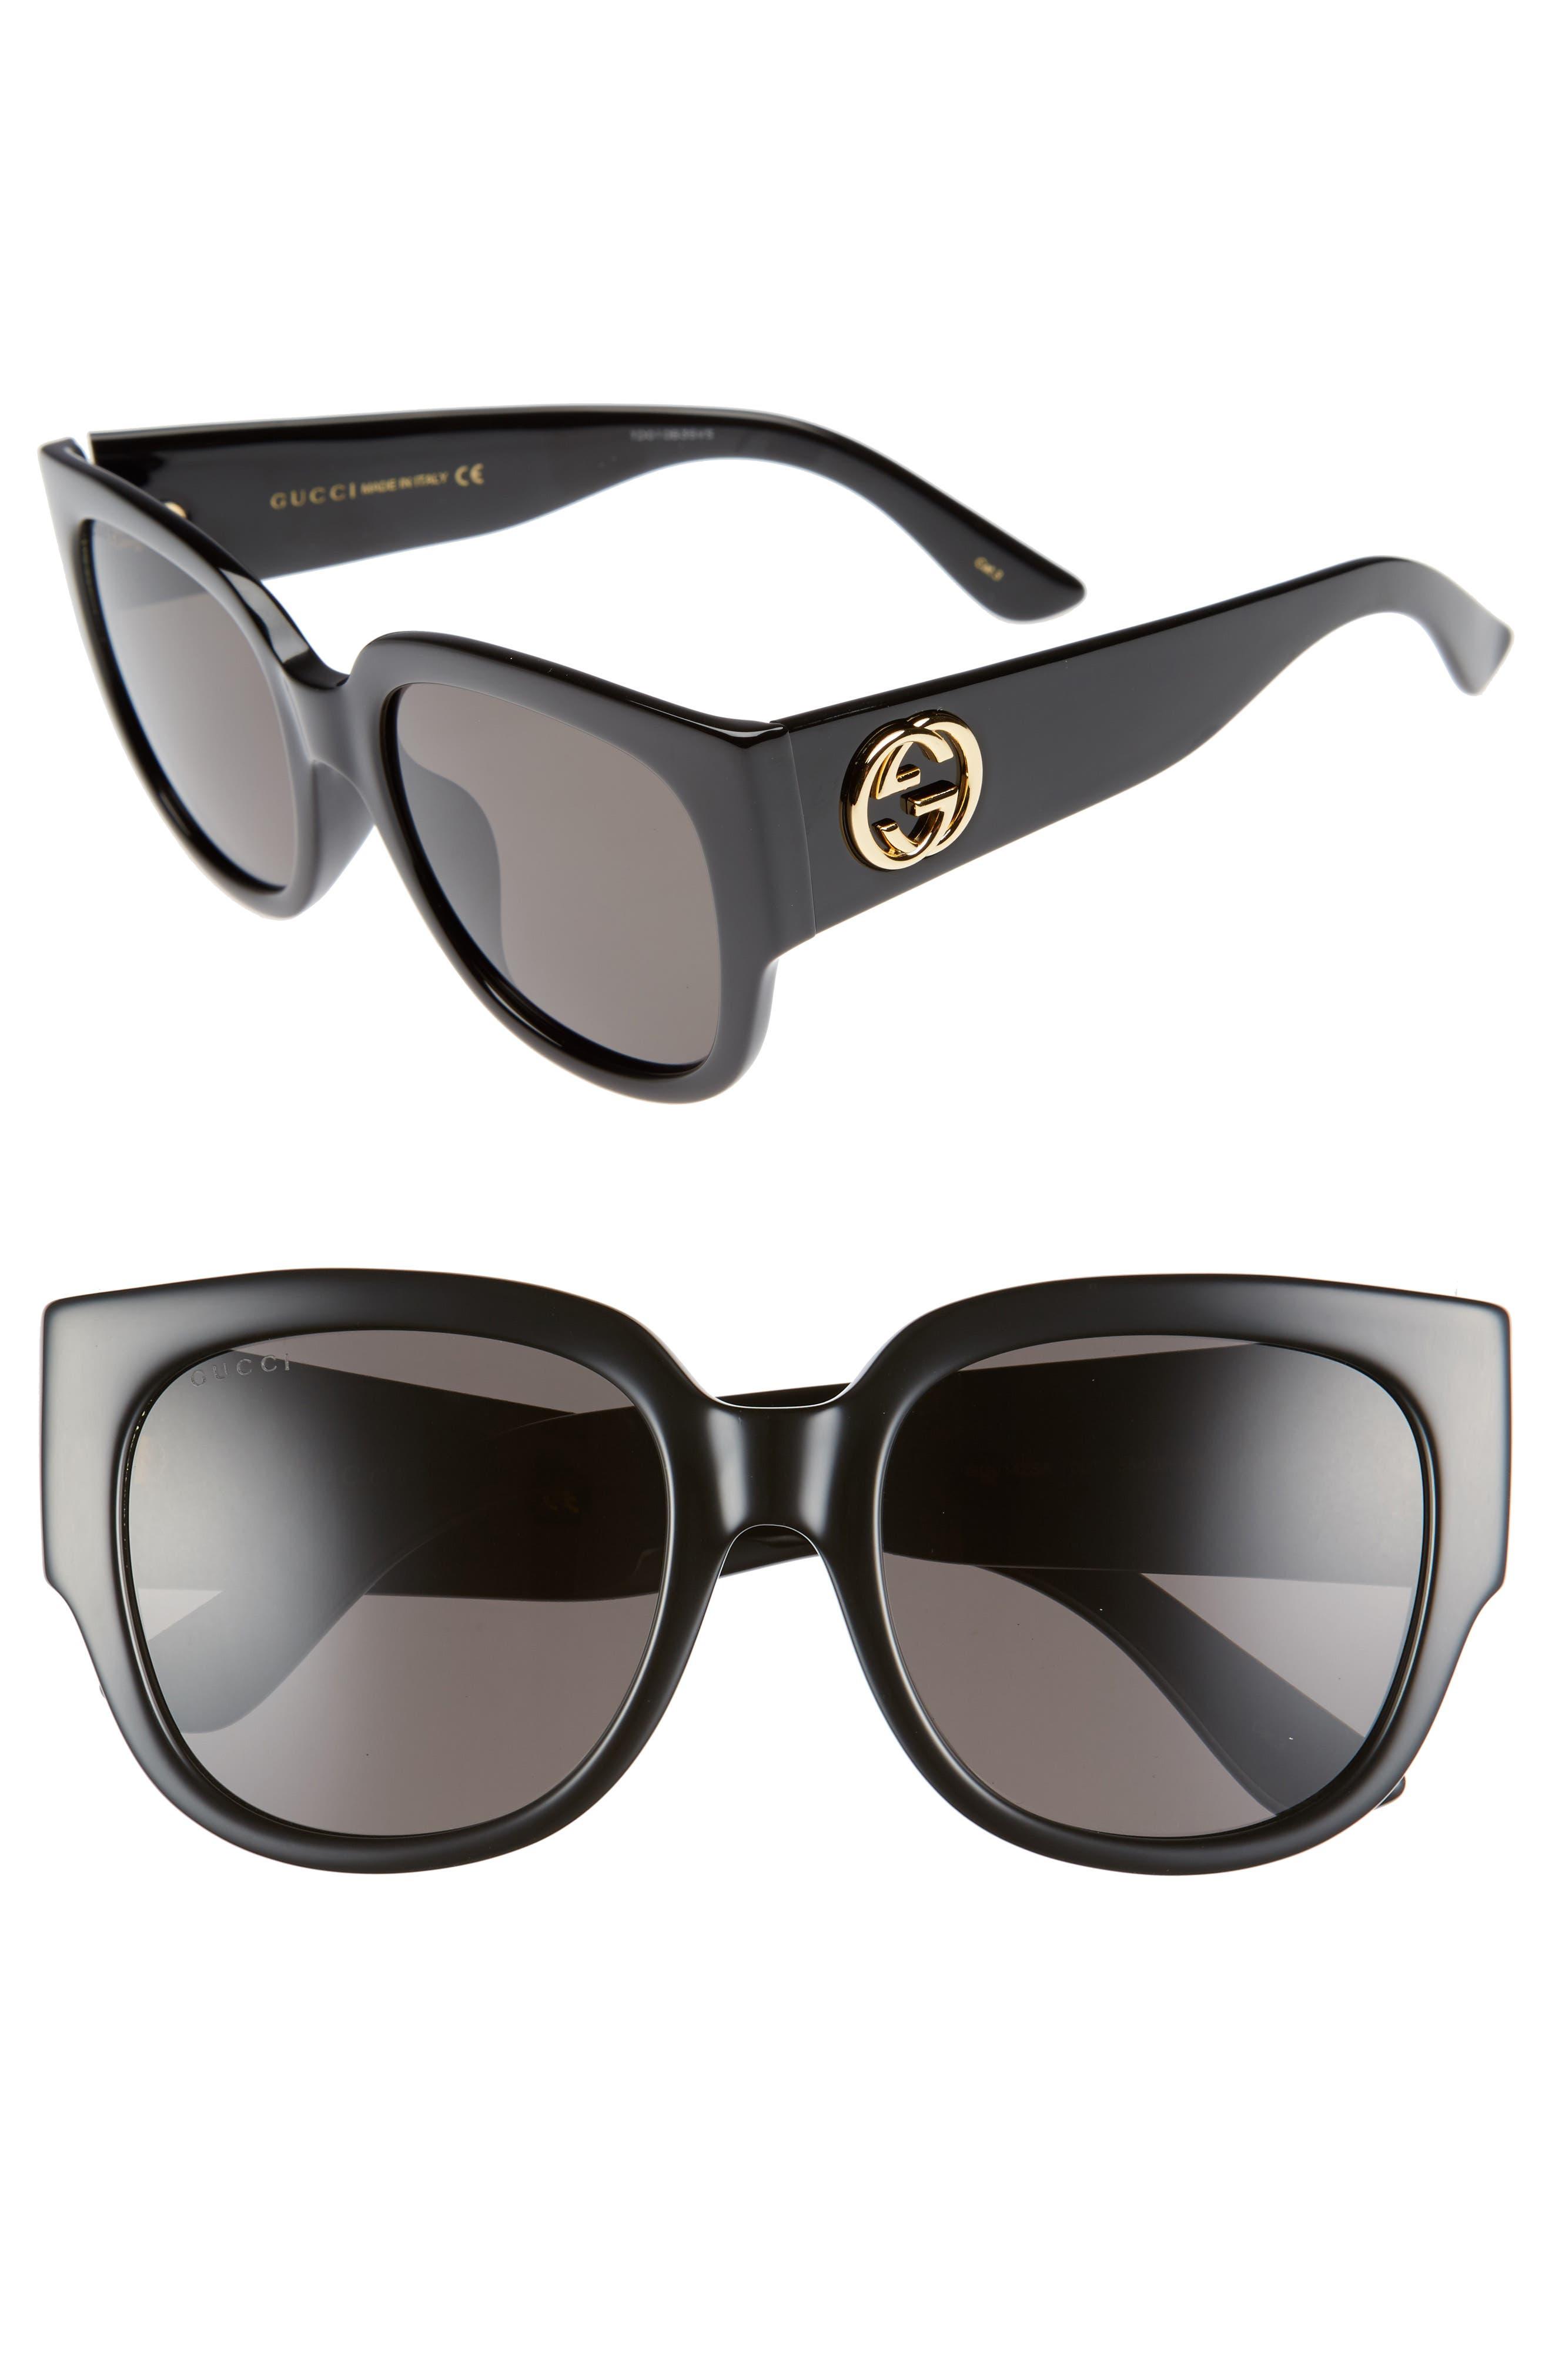 55mm Square Cat Eye Sunglasses,                             Main thumbnail 1, color,                             Black/ Grey